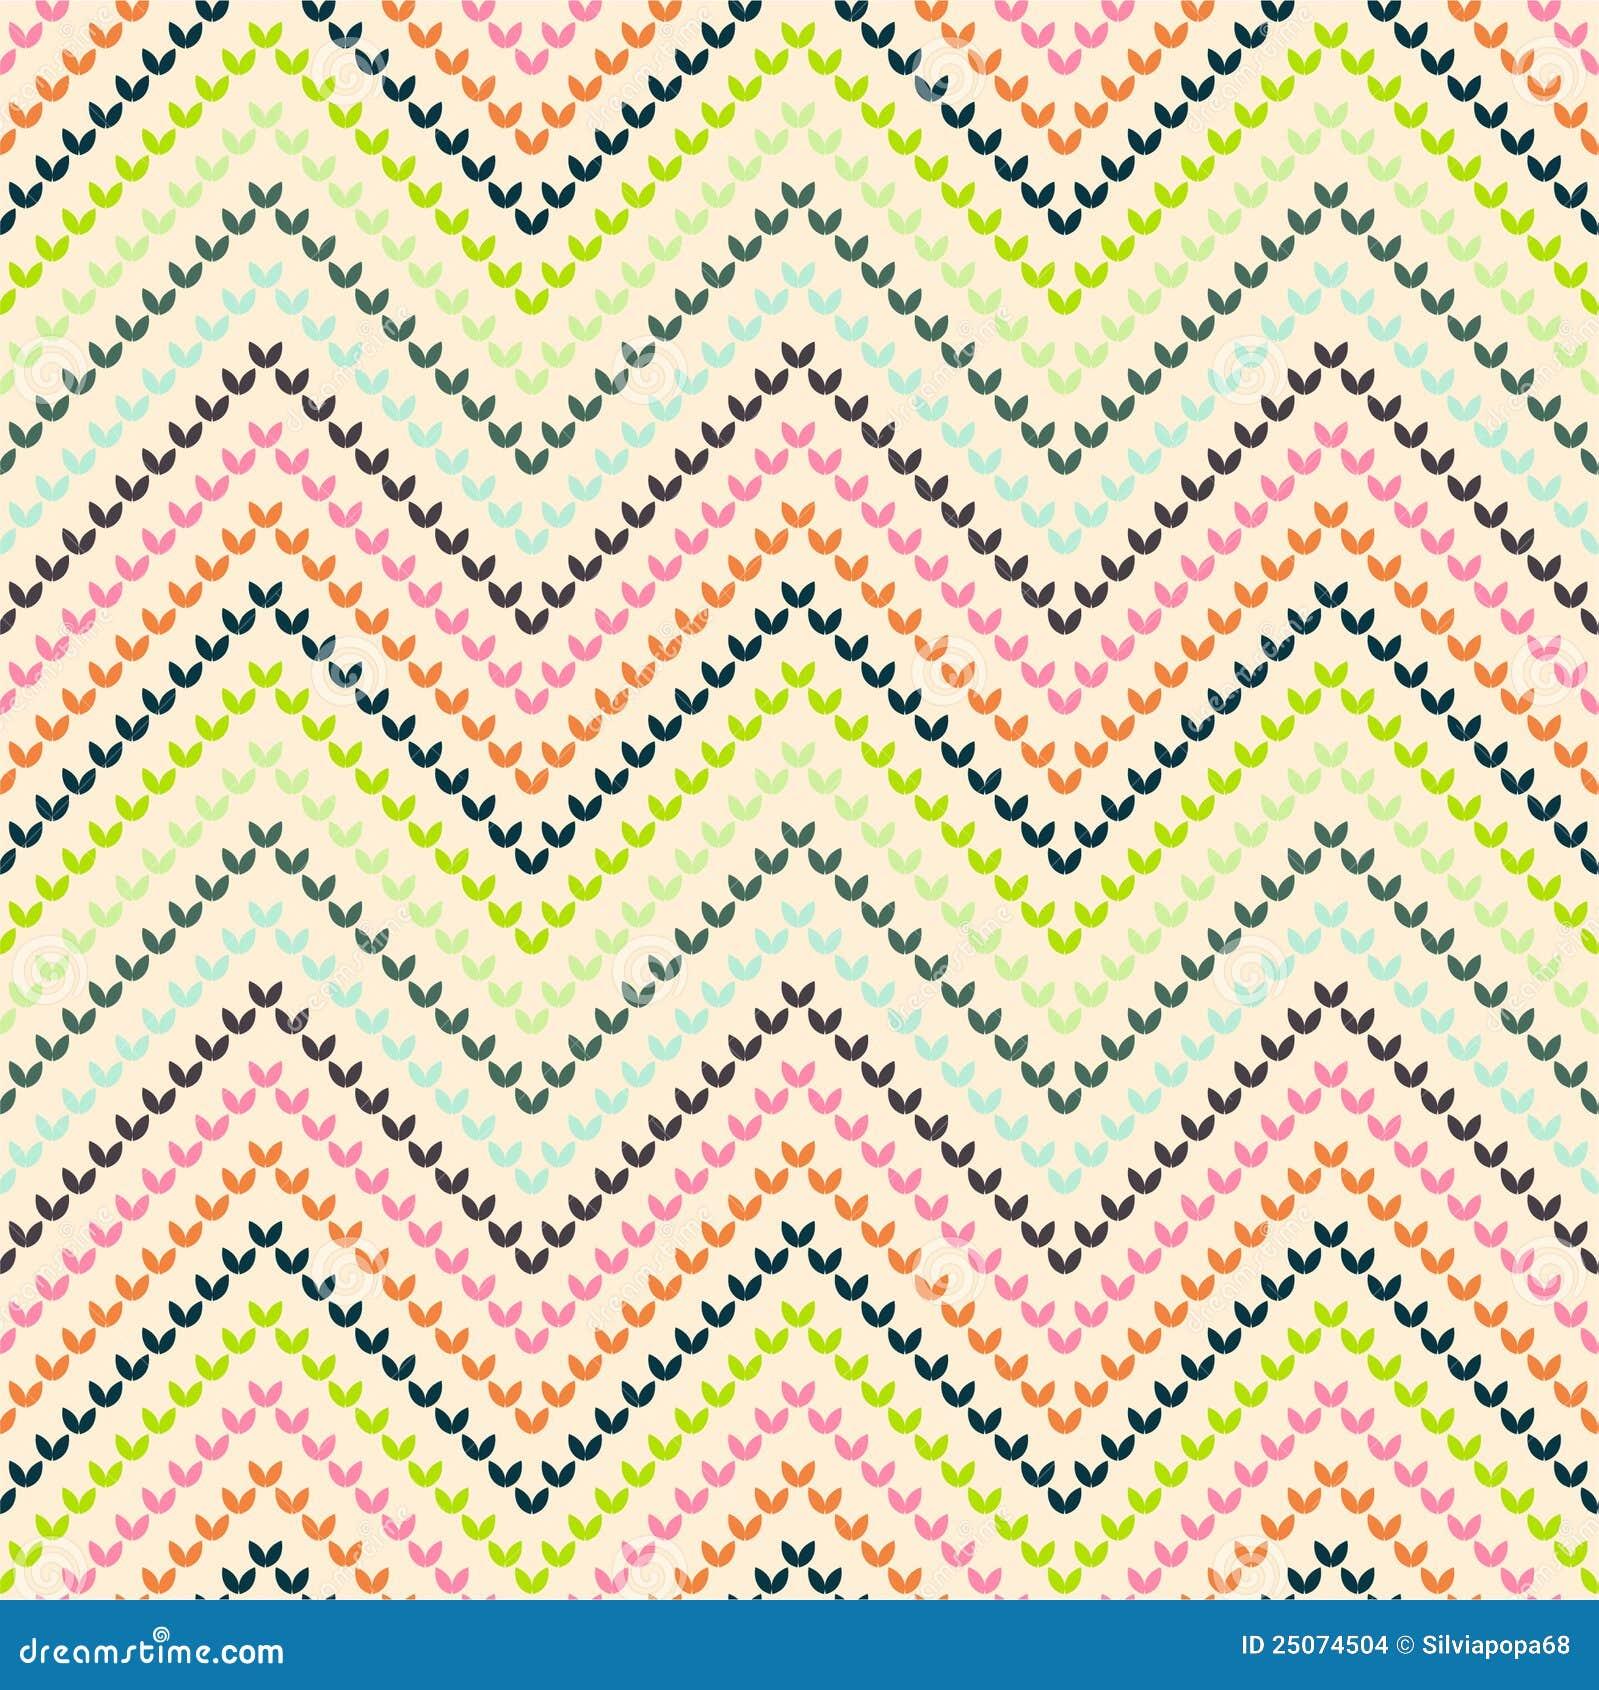 Stock Images Zigzag Pattern Warm Color Image25074504 on Geometric Design Patterns Chevron